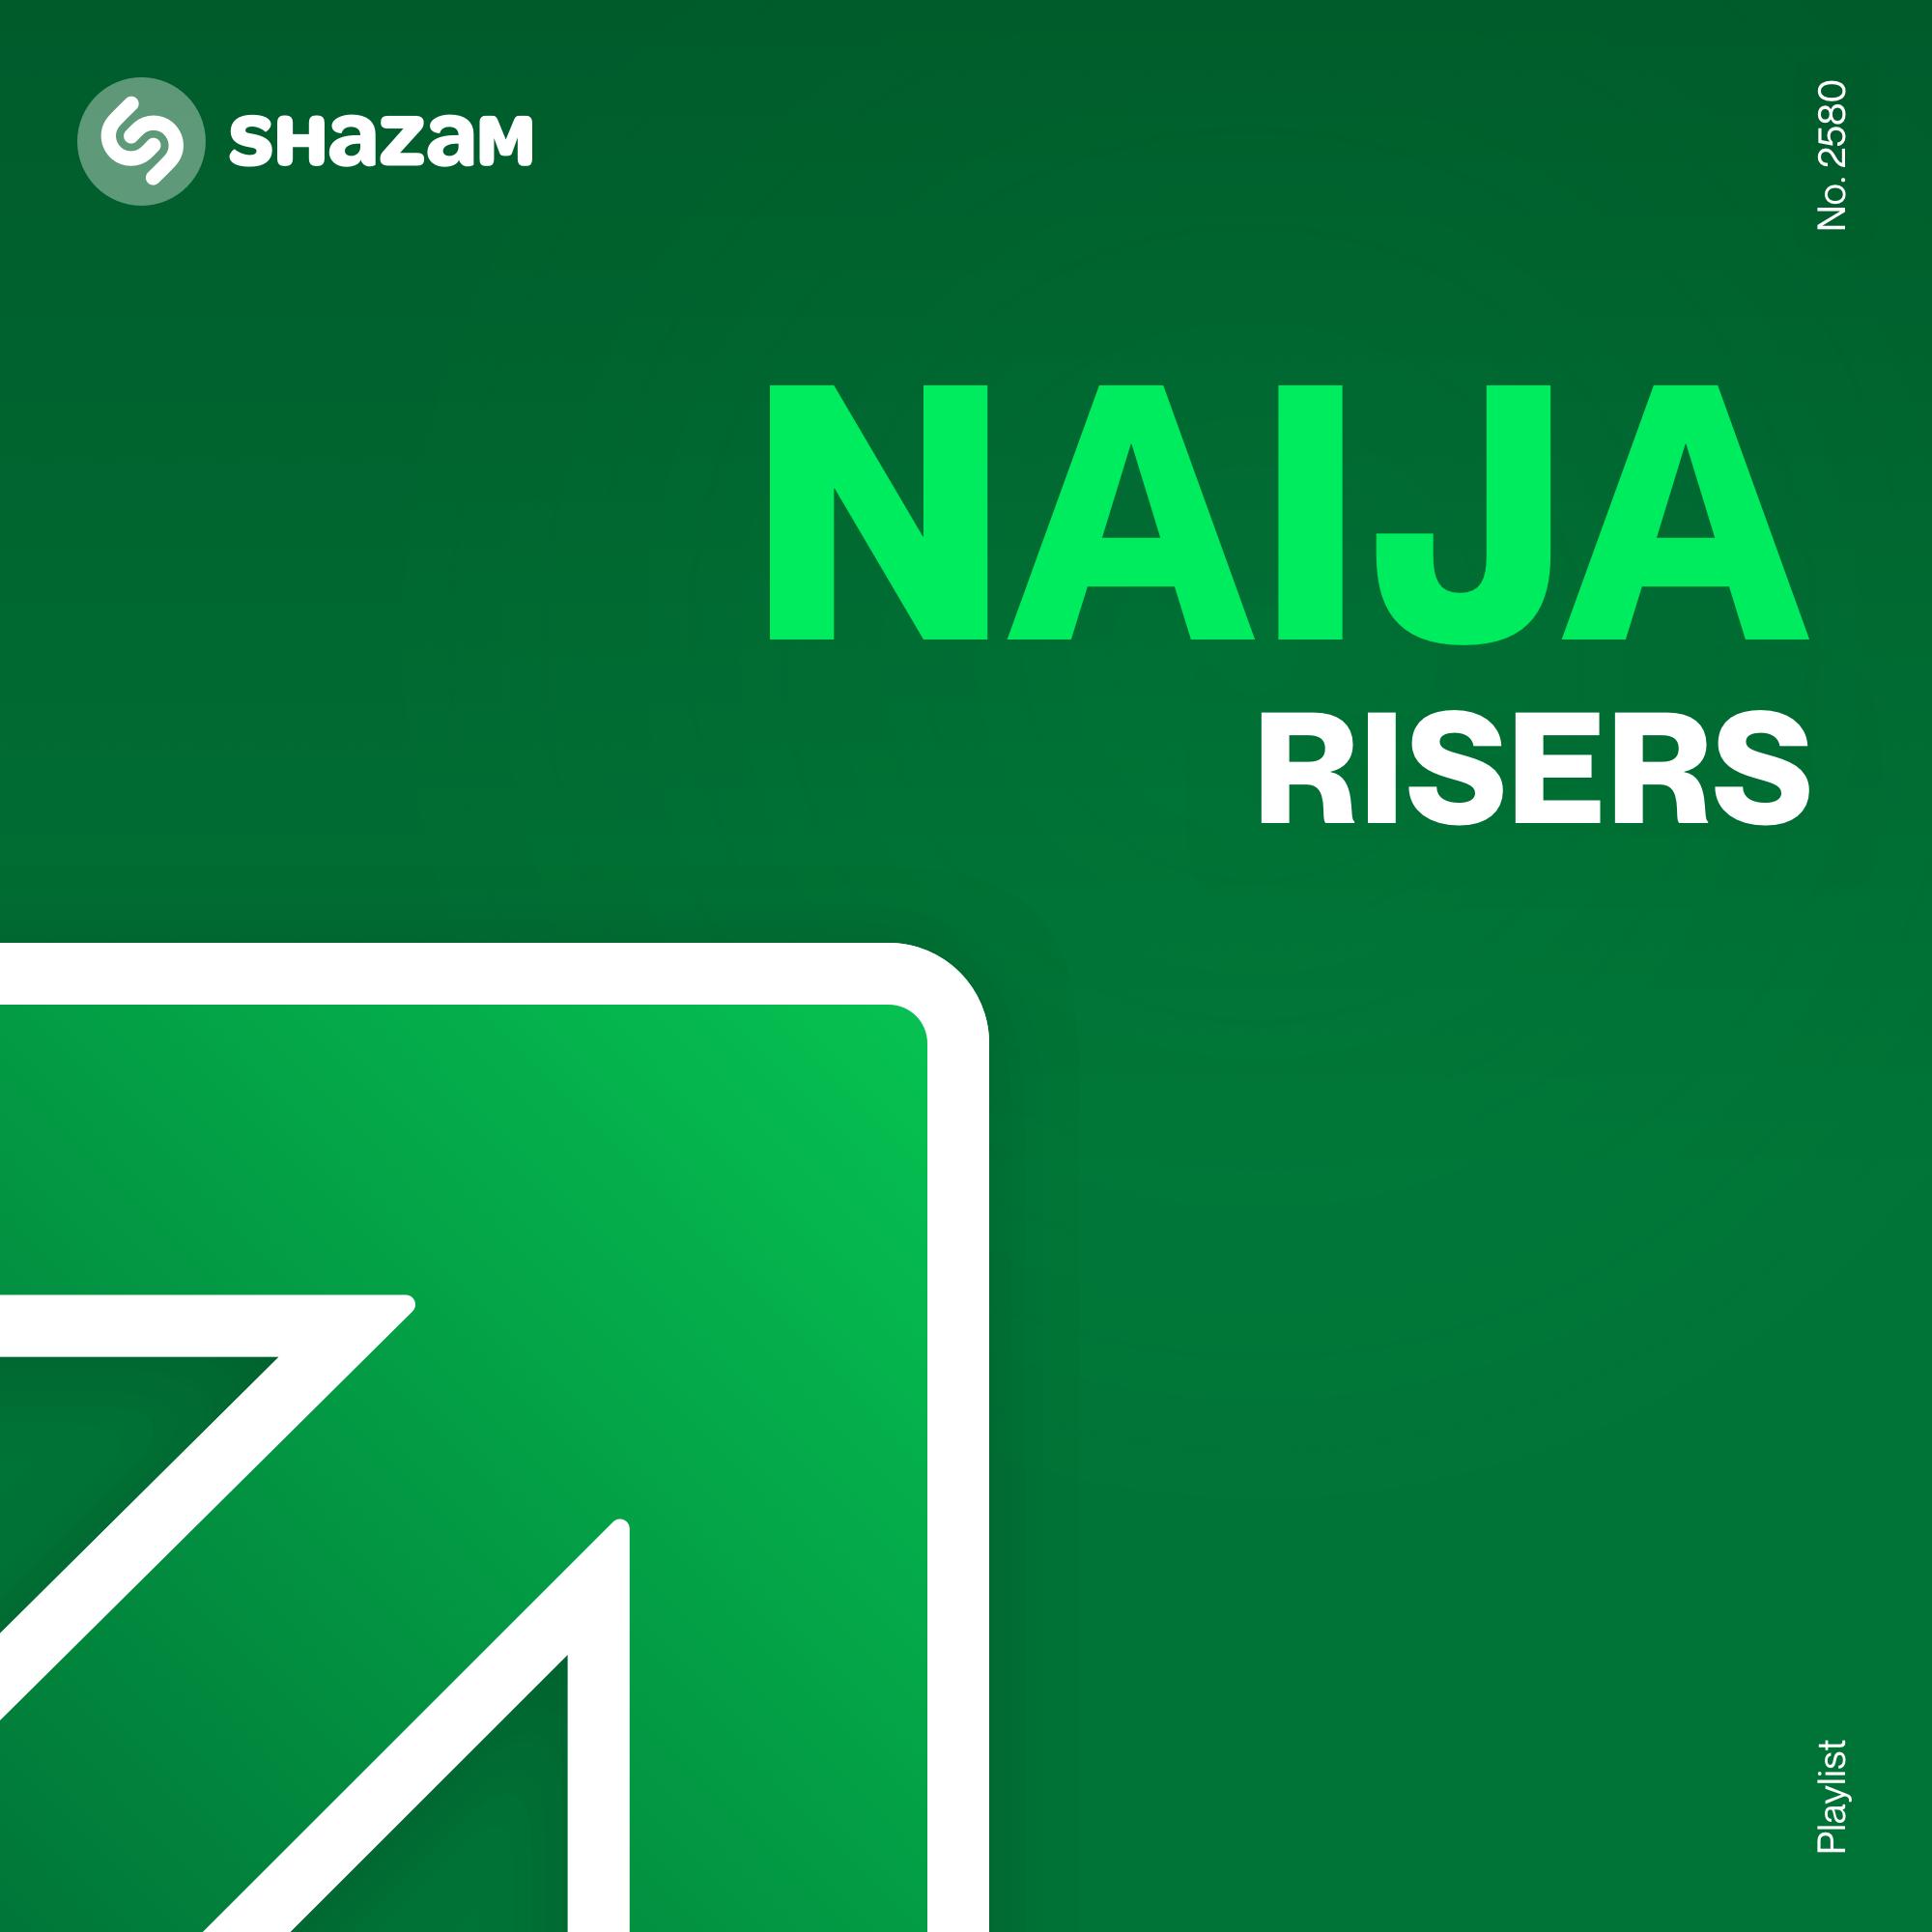 shazam-launches-new-naija-risers-playlist-on-apple-music